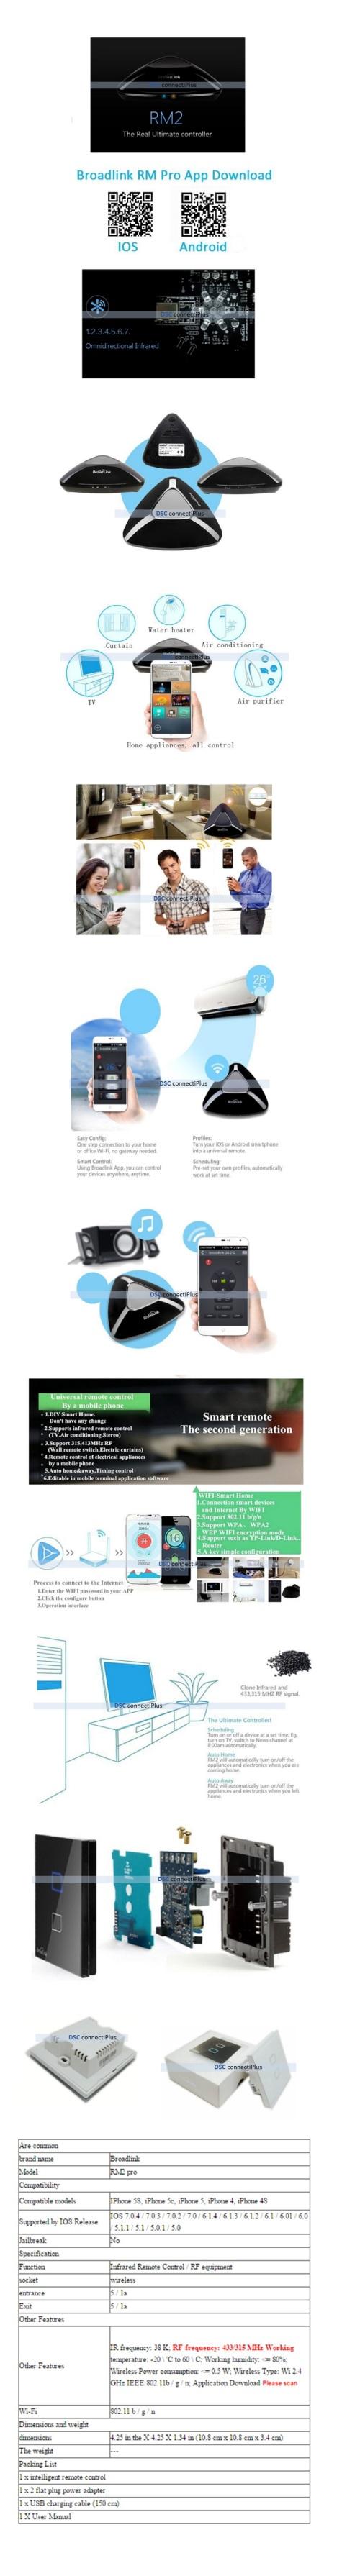 Home Automation - Broadlink RM2 RM PRO Universal Wireless Remote